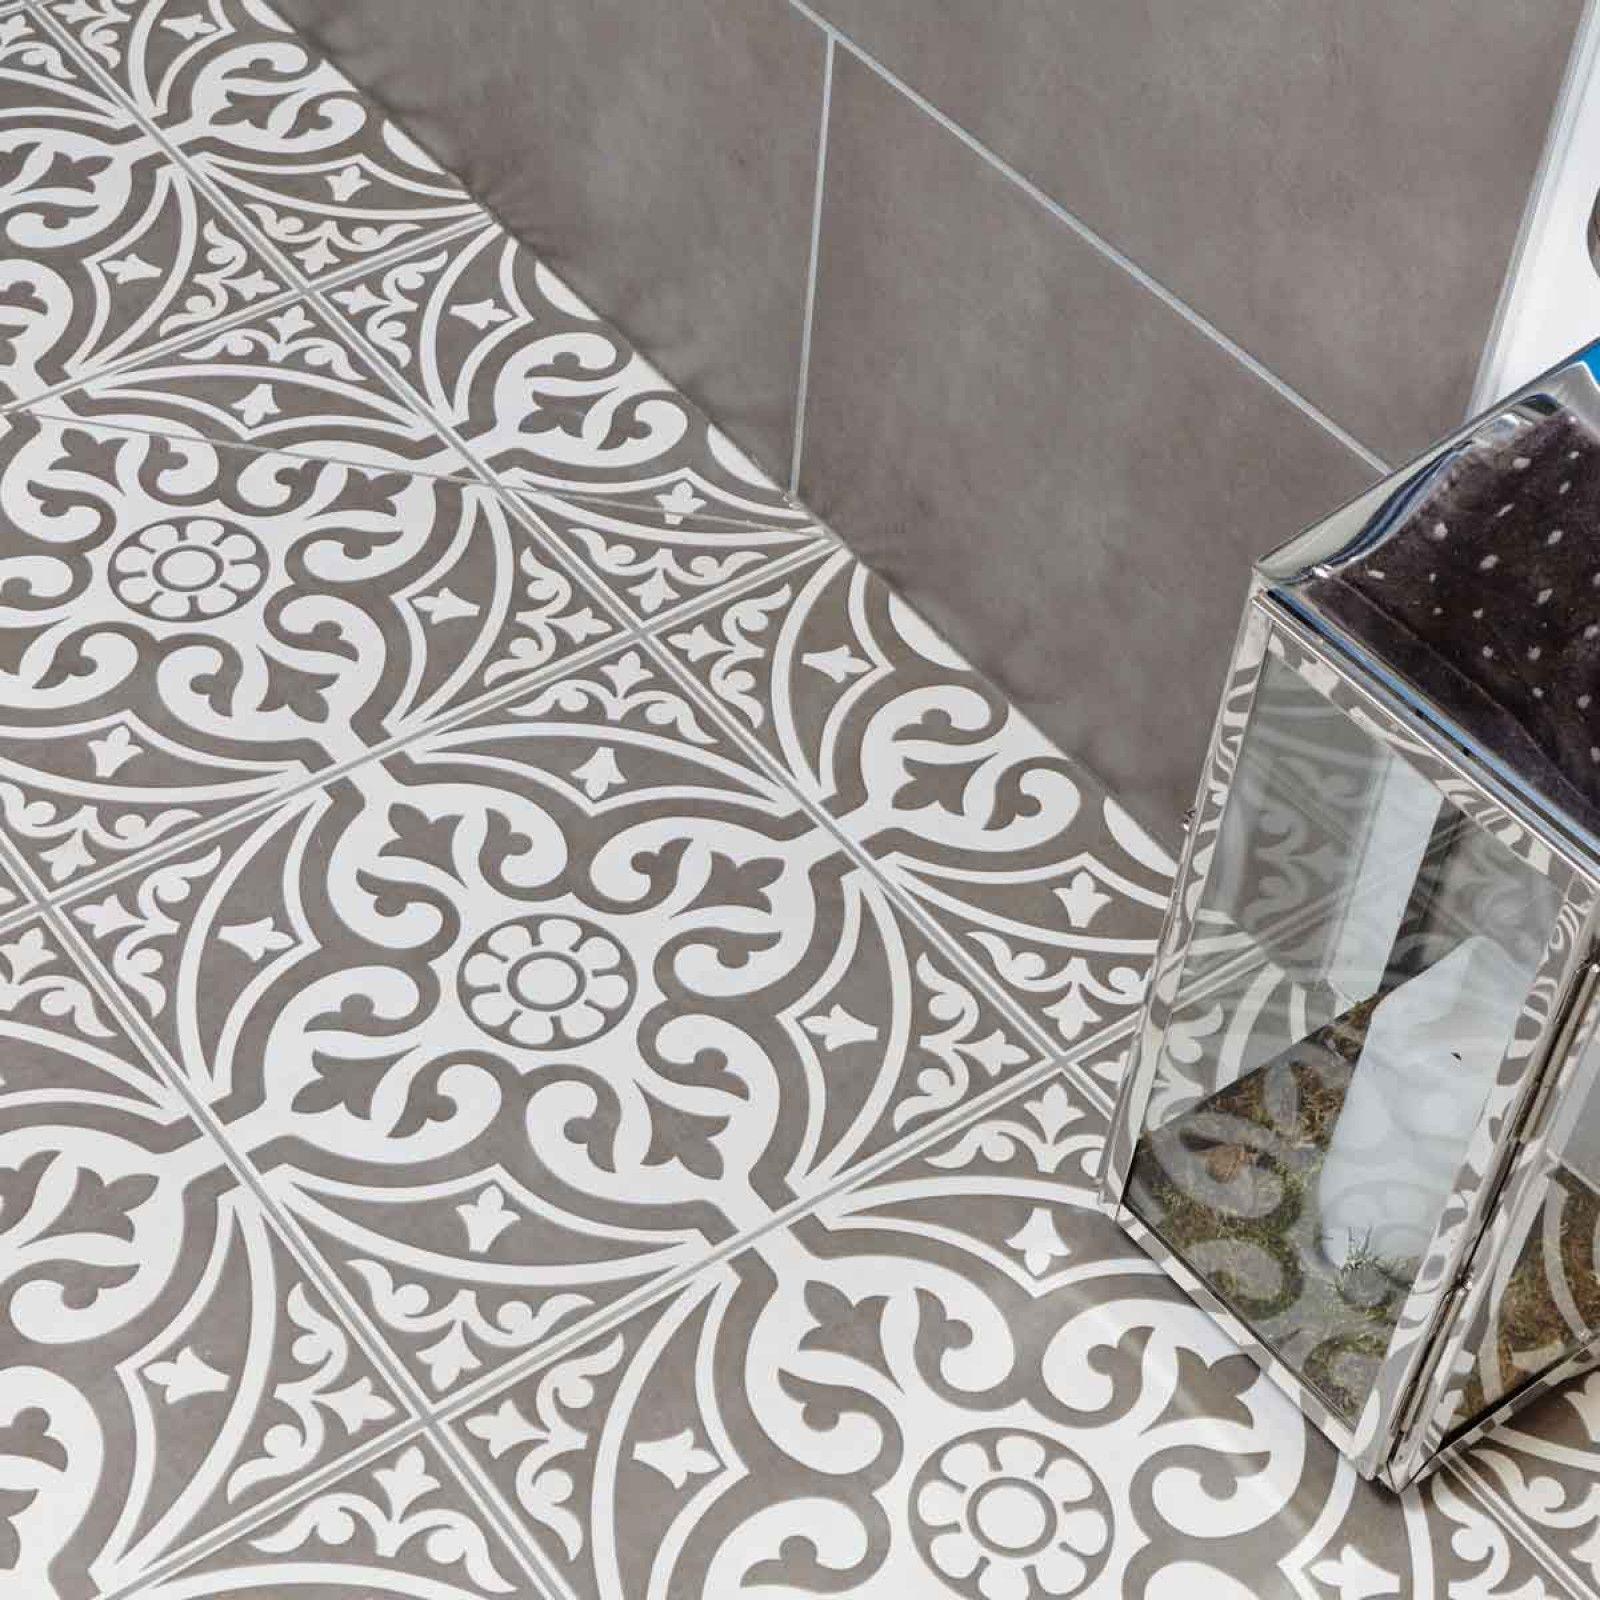 Devonstone Grey Feature Patterned Bathroom Tiles Bathroom Floor Tile Patterns Patterned Floor Tiles